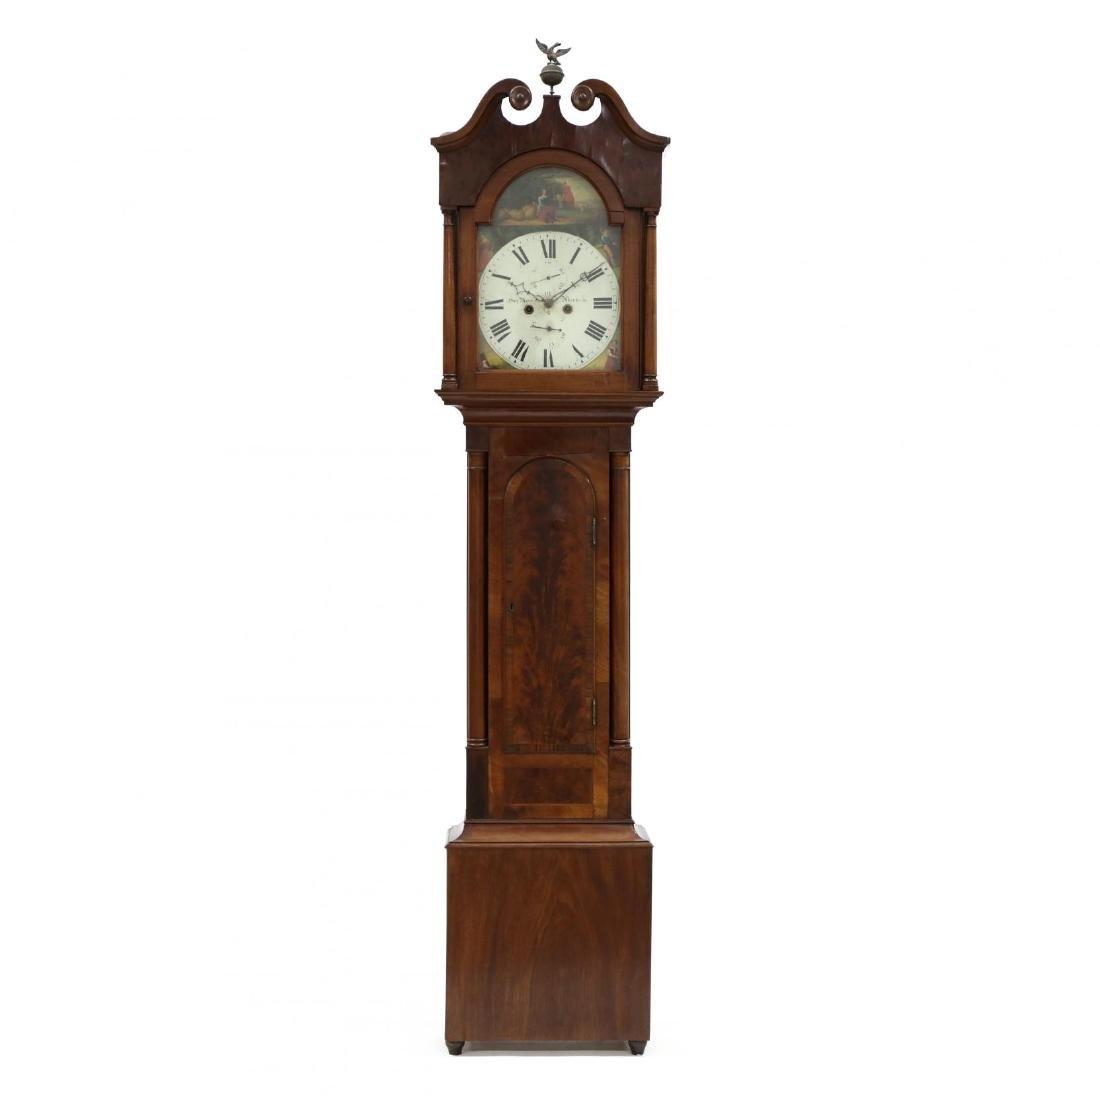 Scottish Mahogany Tall Case Clock, Hay Mercer, Aberdeen